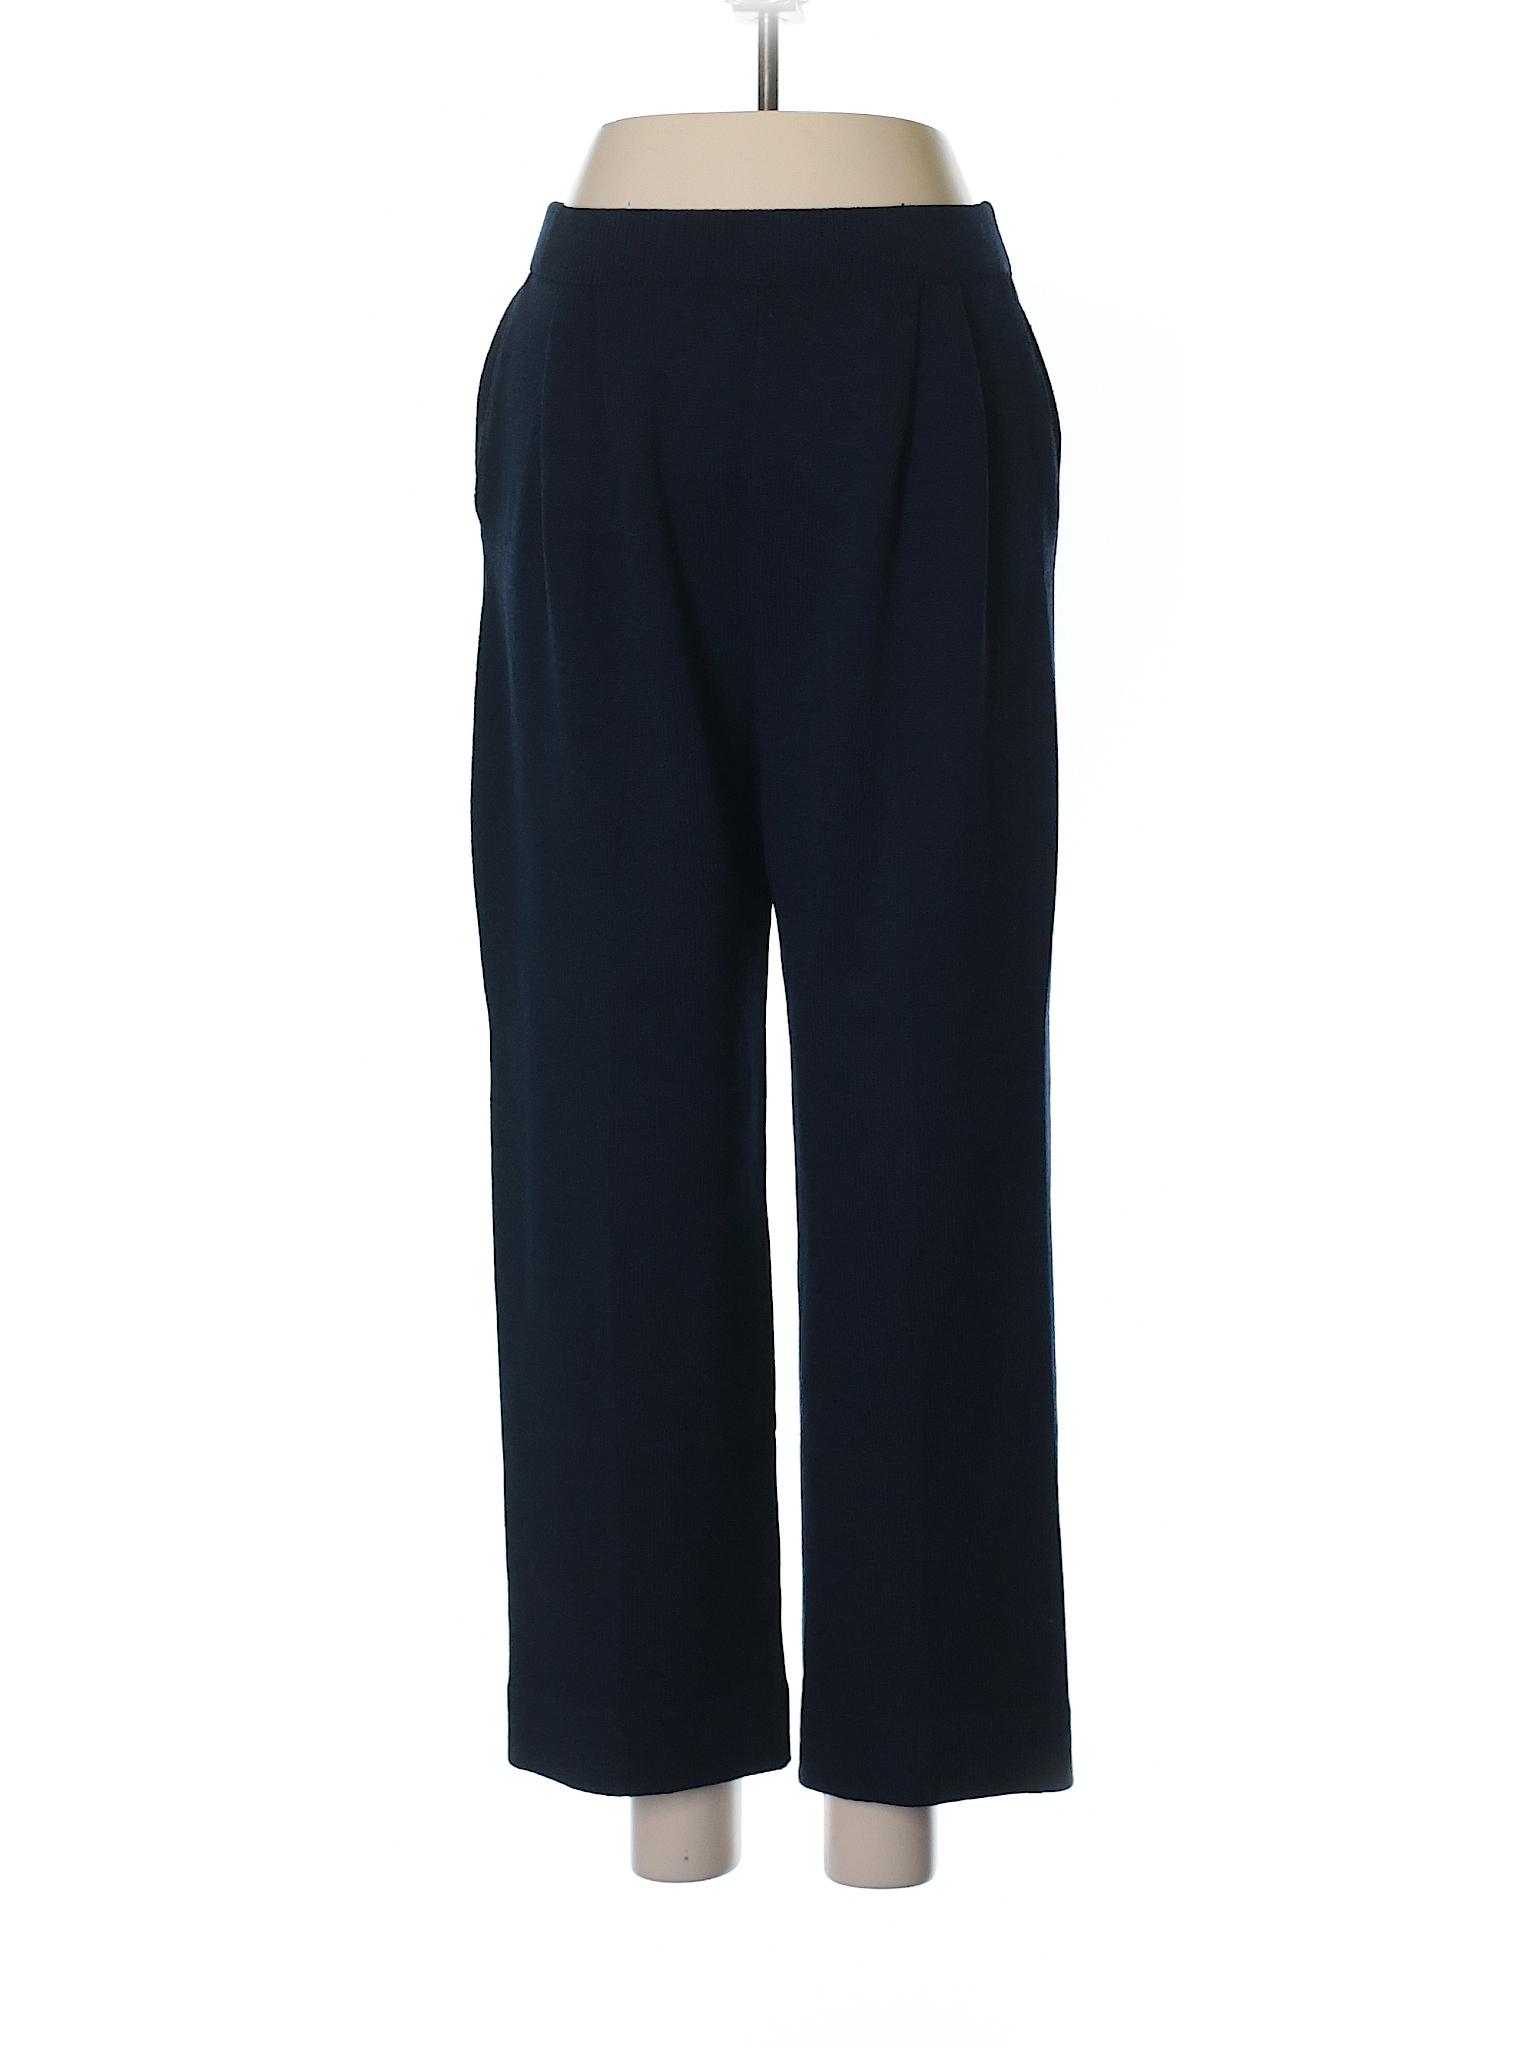 Pants Boutique John Winter Casual St 4qqwPxI6n